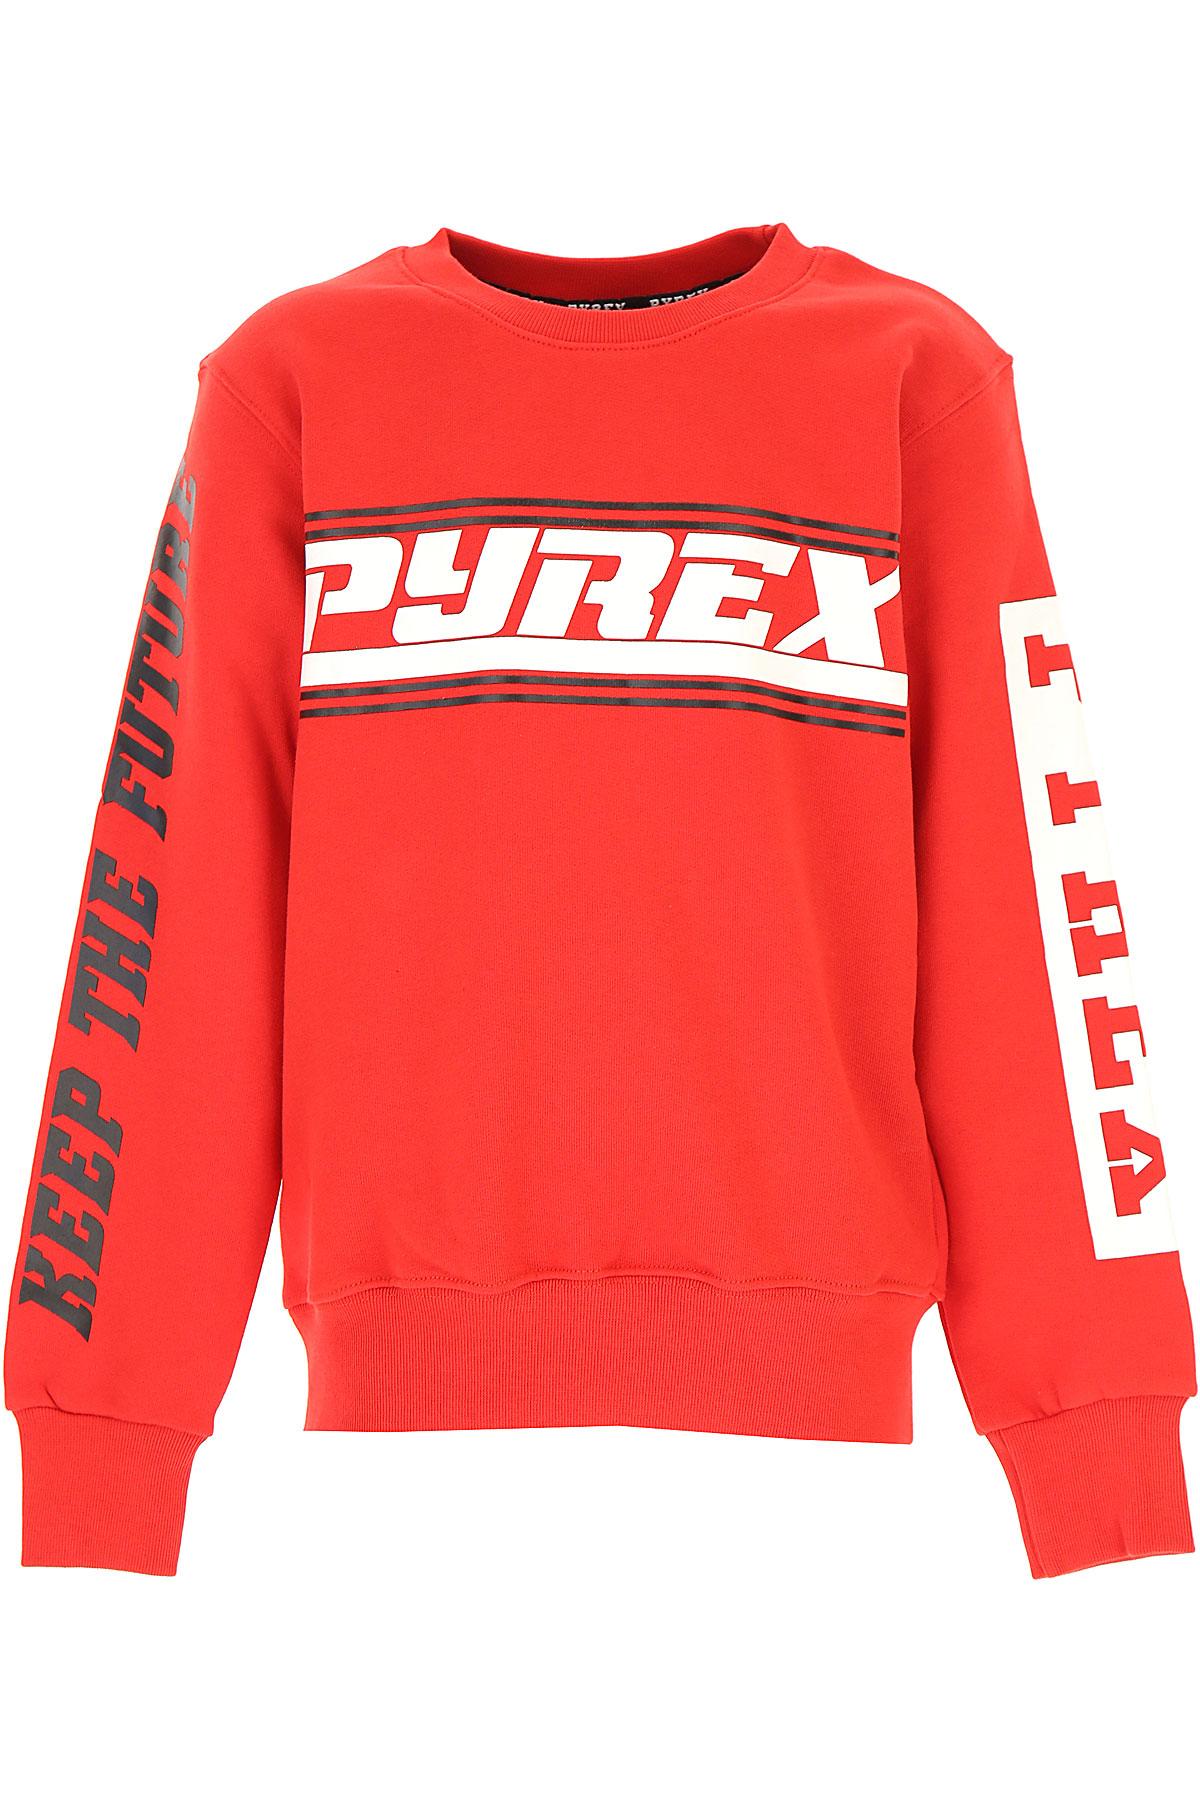 Pyrex Kids Sweatshirts & Hoodies for Boys On Sale, Red, Cotton, 2019, L M S XL XS XXL (16 Y)